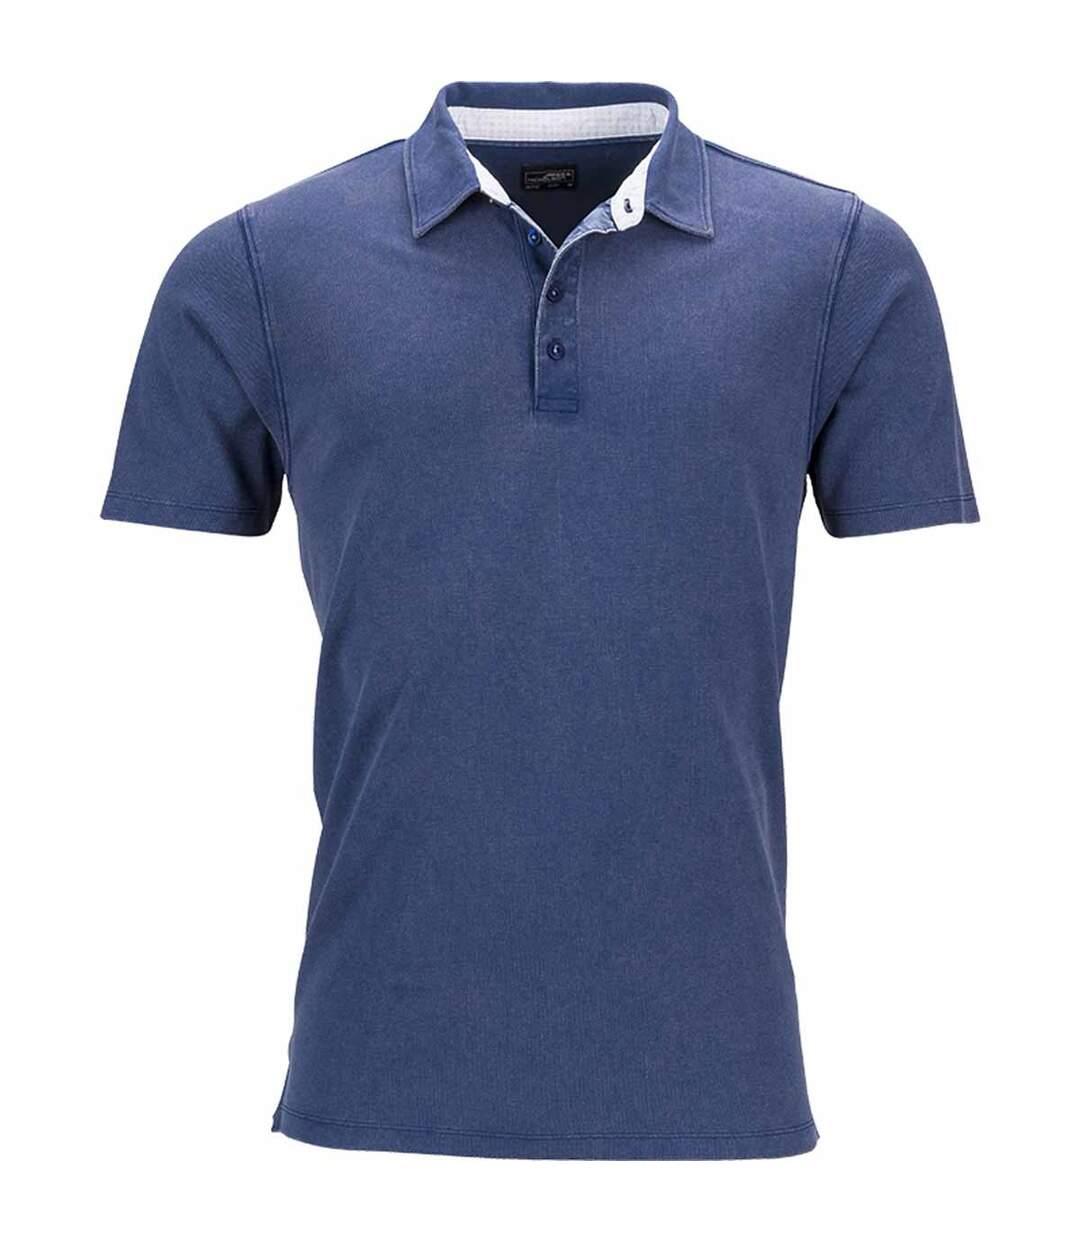 Polo homme manches courtes col imprimé - JN712 - bleu marine